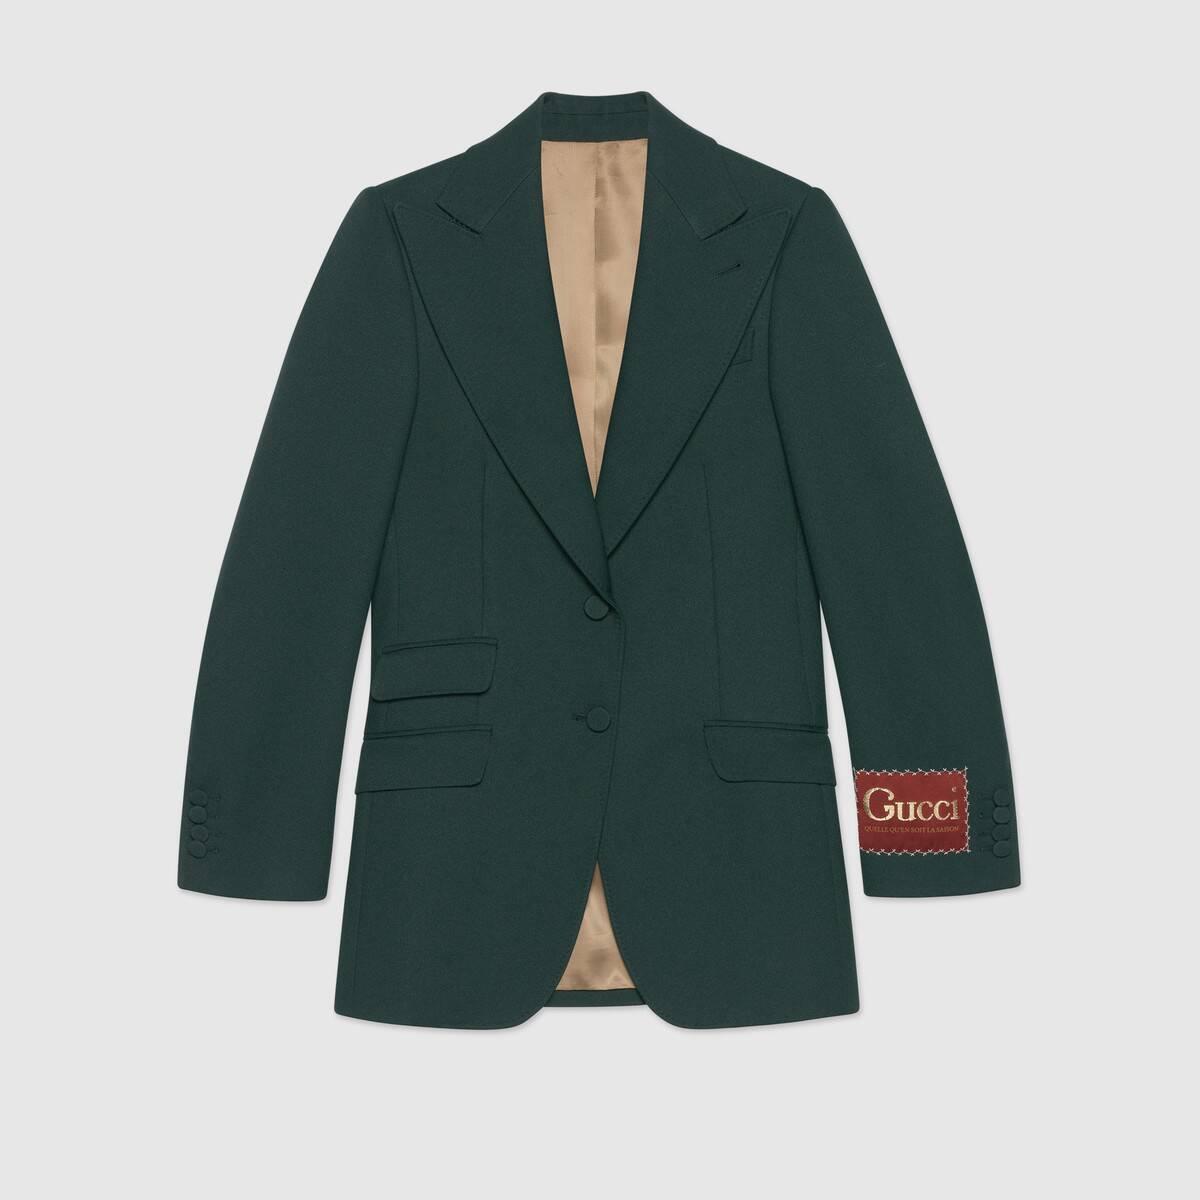 Green gucci jacket at Green Hills Mall